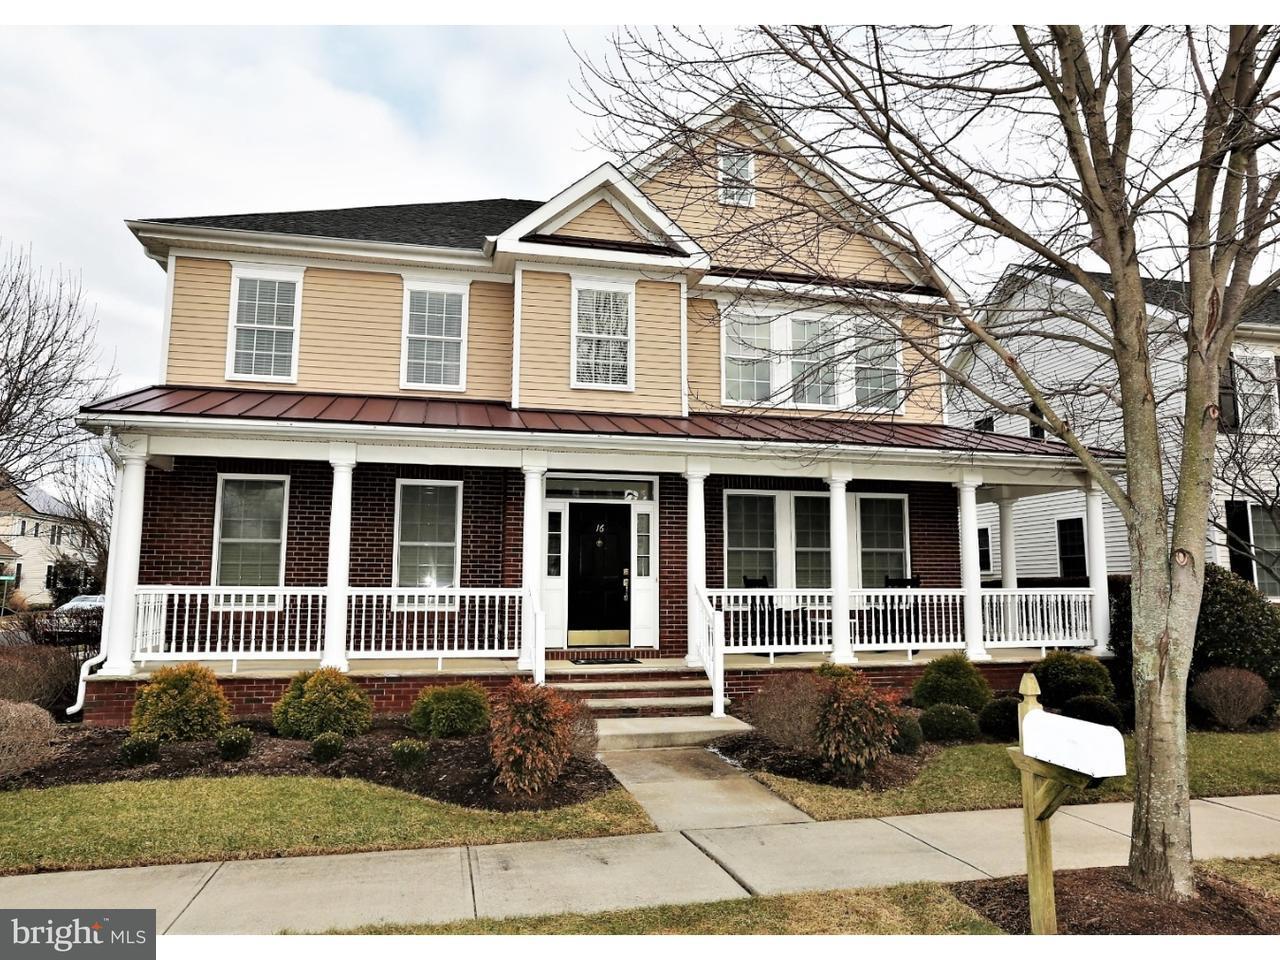 Casa Unifamiliar por un Venta en 16 COLLINGTON Street Chesterfield, Nueva Jersey 08515 Estados UnidosEn/Alrededor: Chesterfield Township